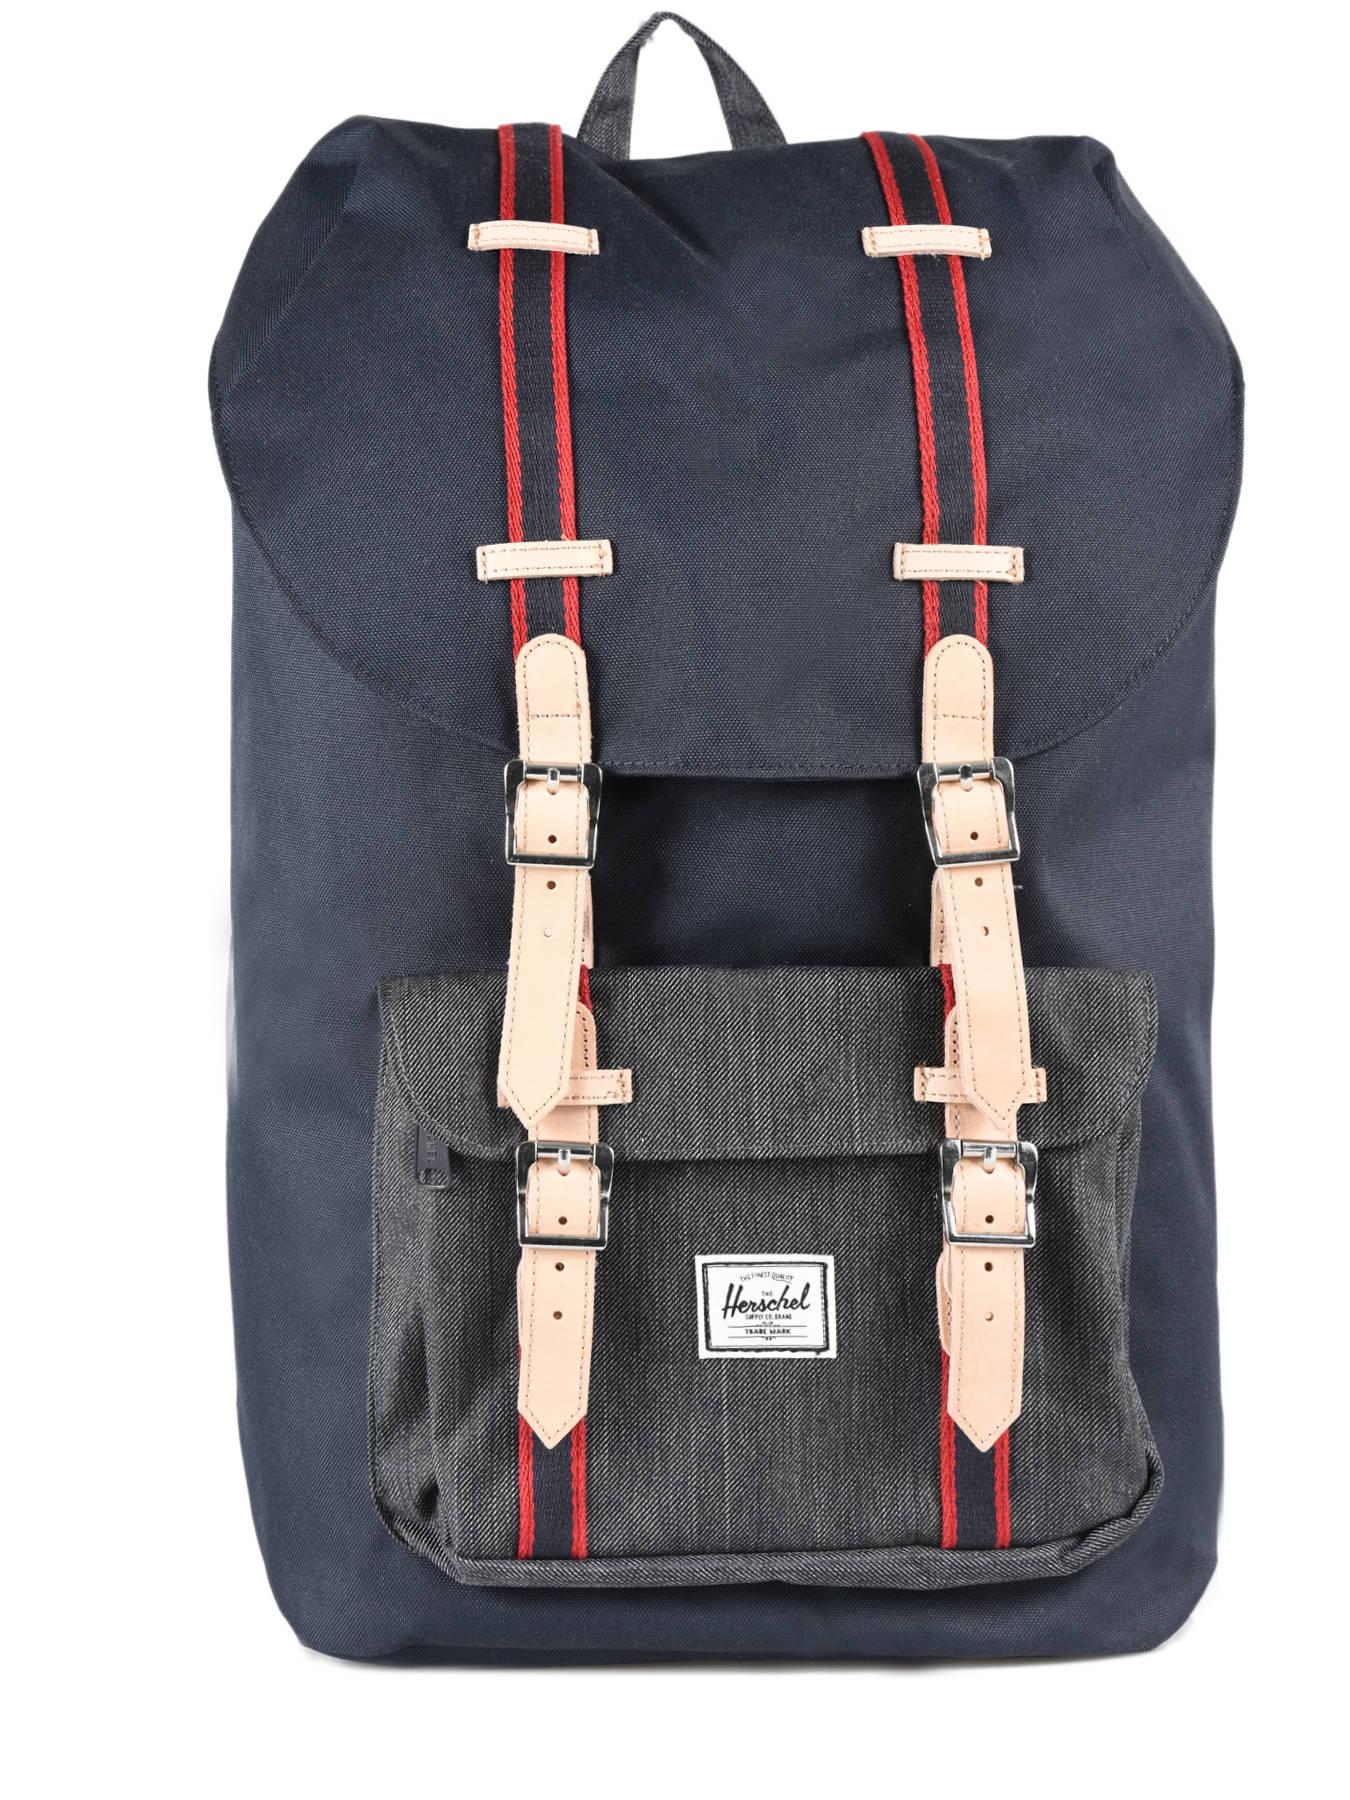 1e340d4644 ... Backpack 1 Compartment Herschel Black offset 10014-O ...